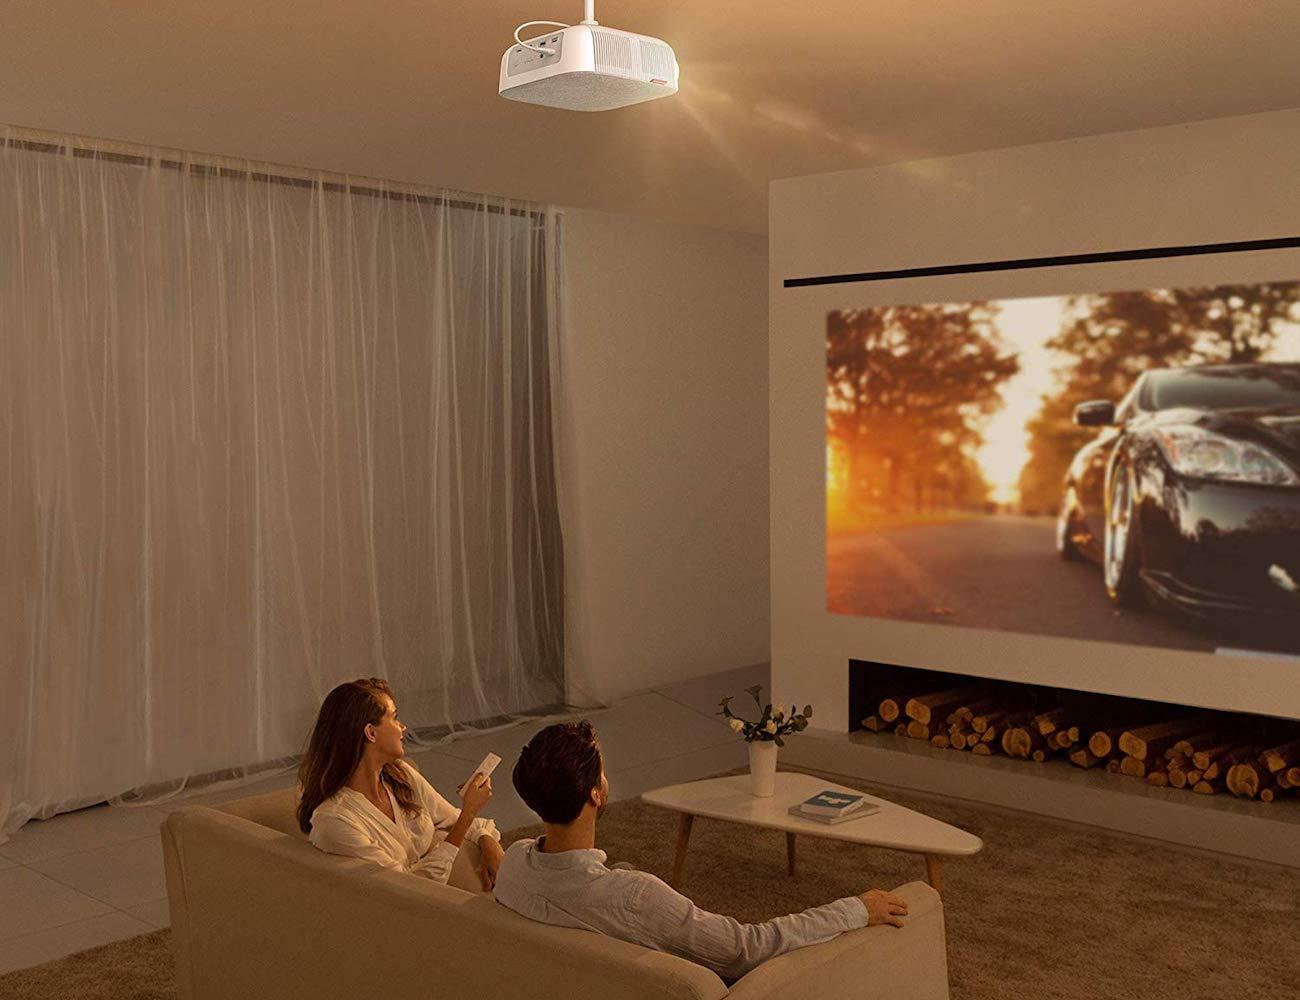 Anker Nebula Prizm LCD Multimedia Projector